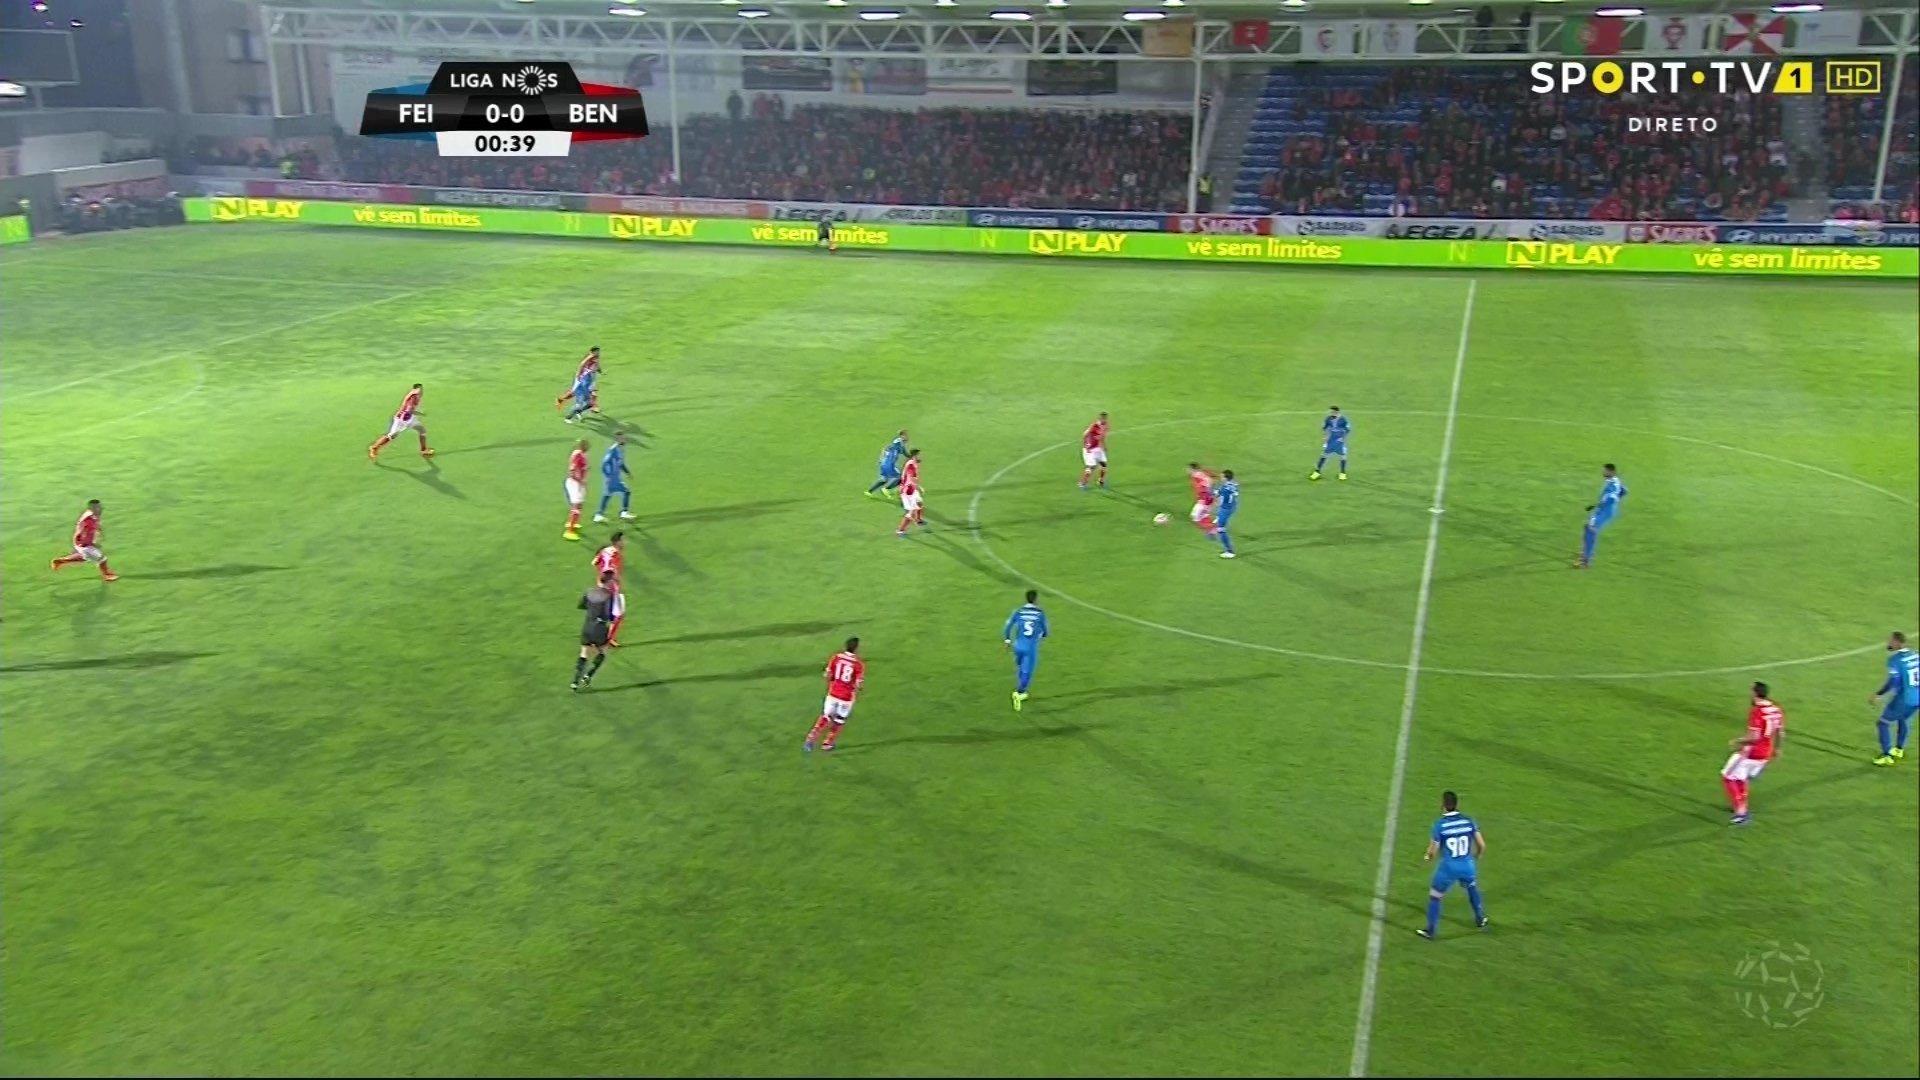 Benfica braga online free